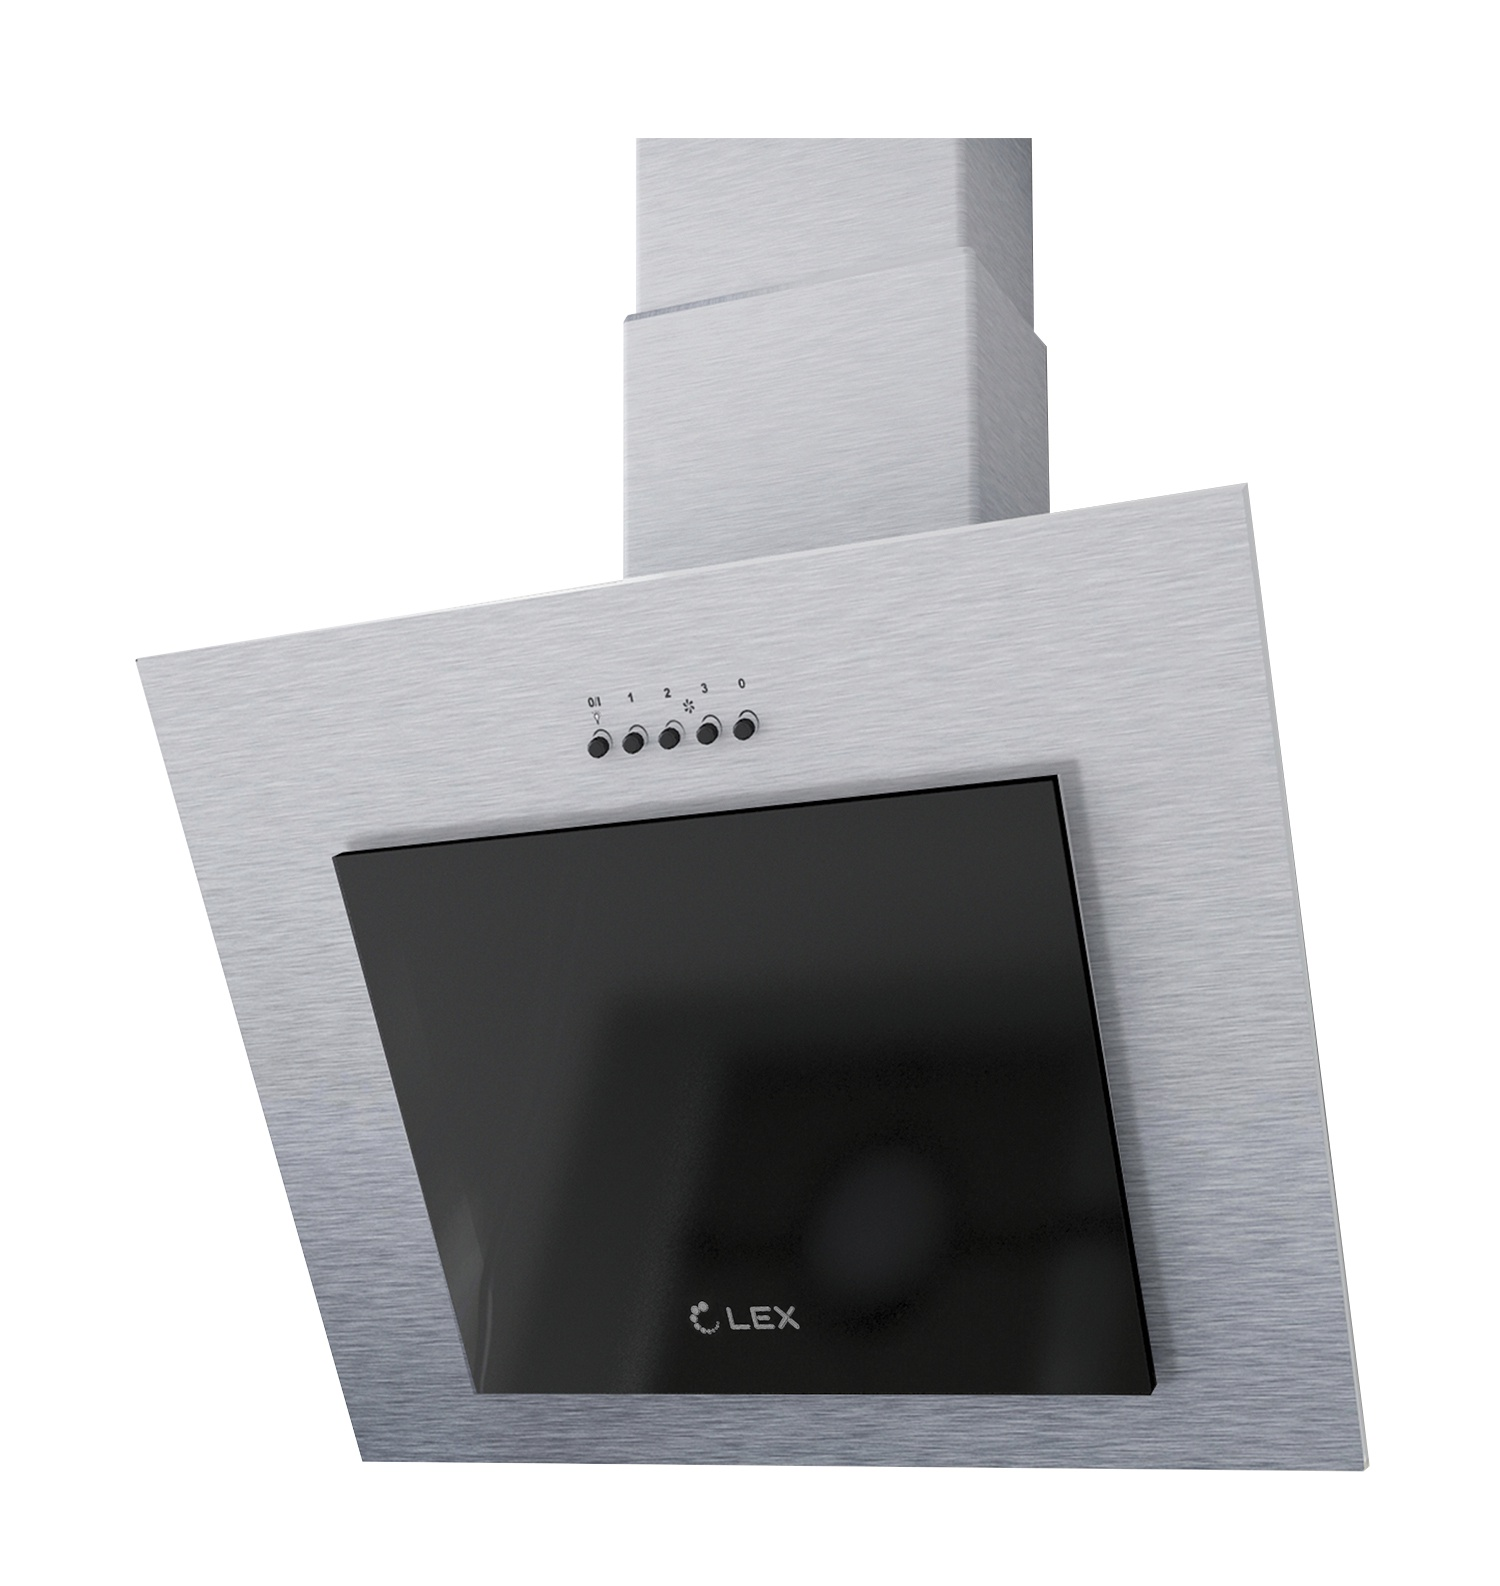 Вытяжка Lex Mini 600 Inox, серый металлик